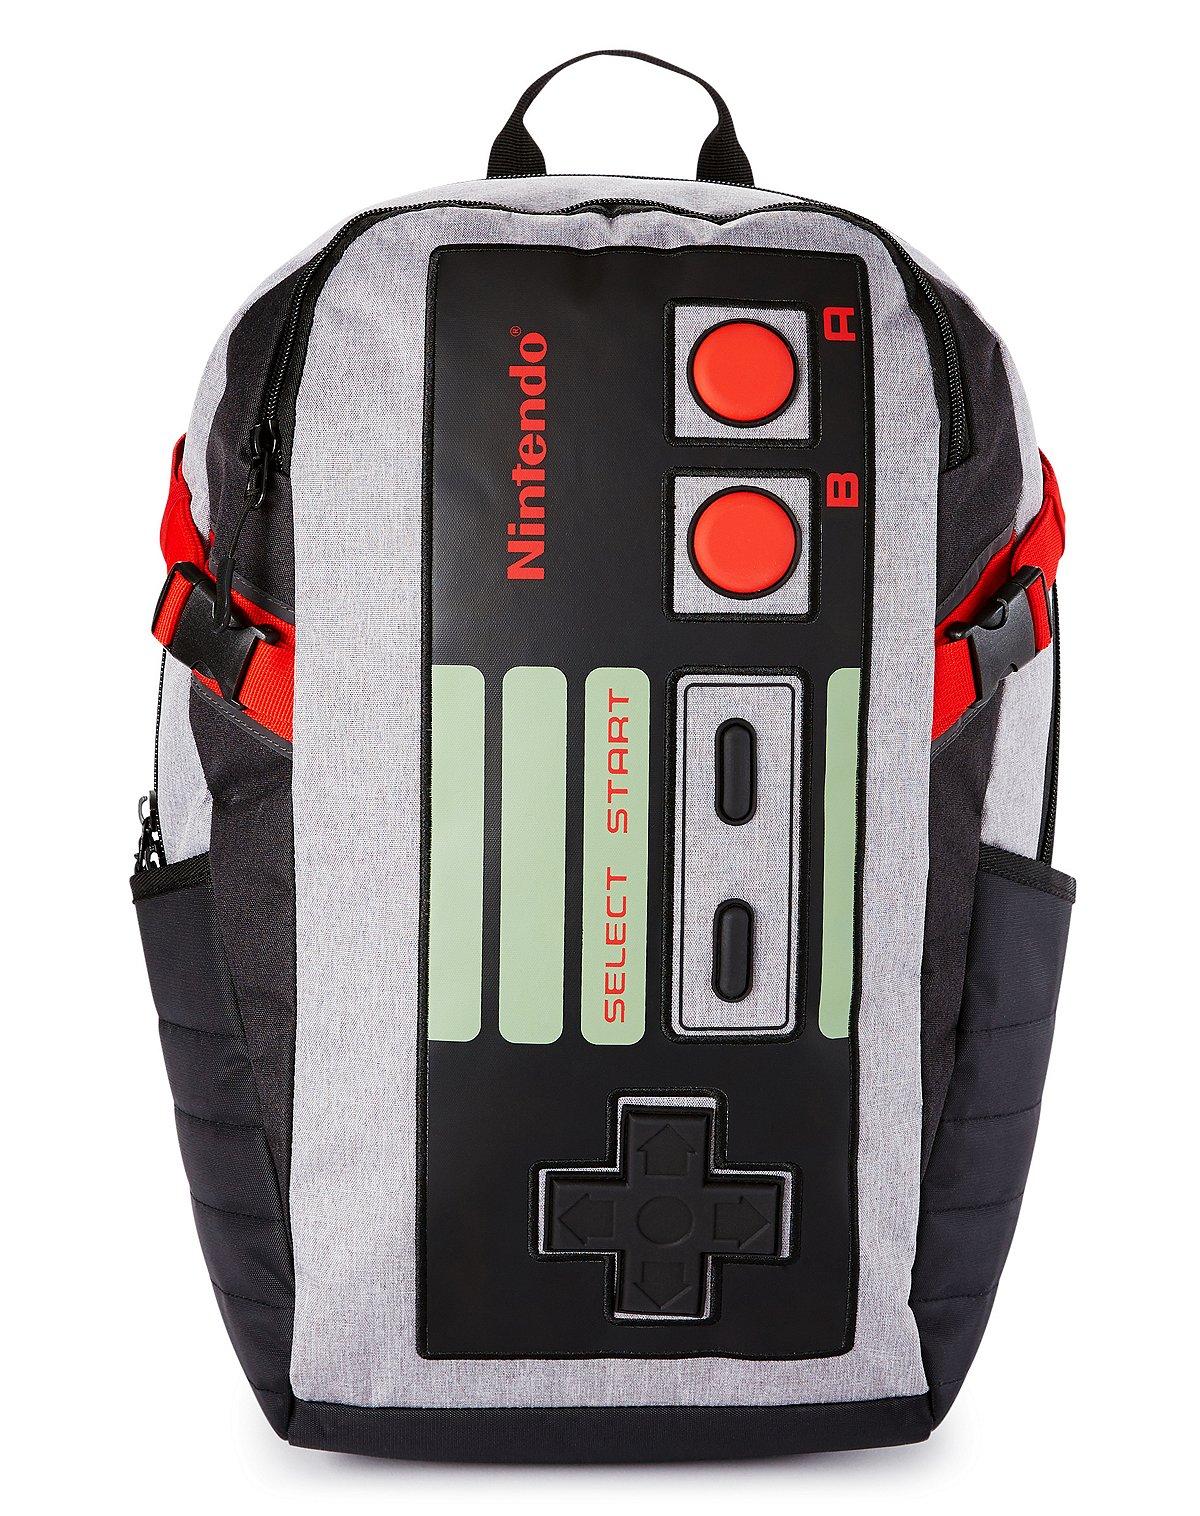 NES Controller Backpack